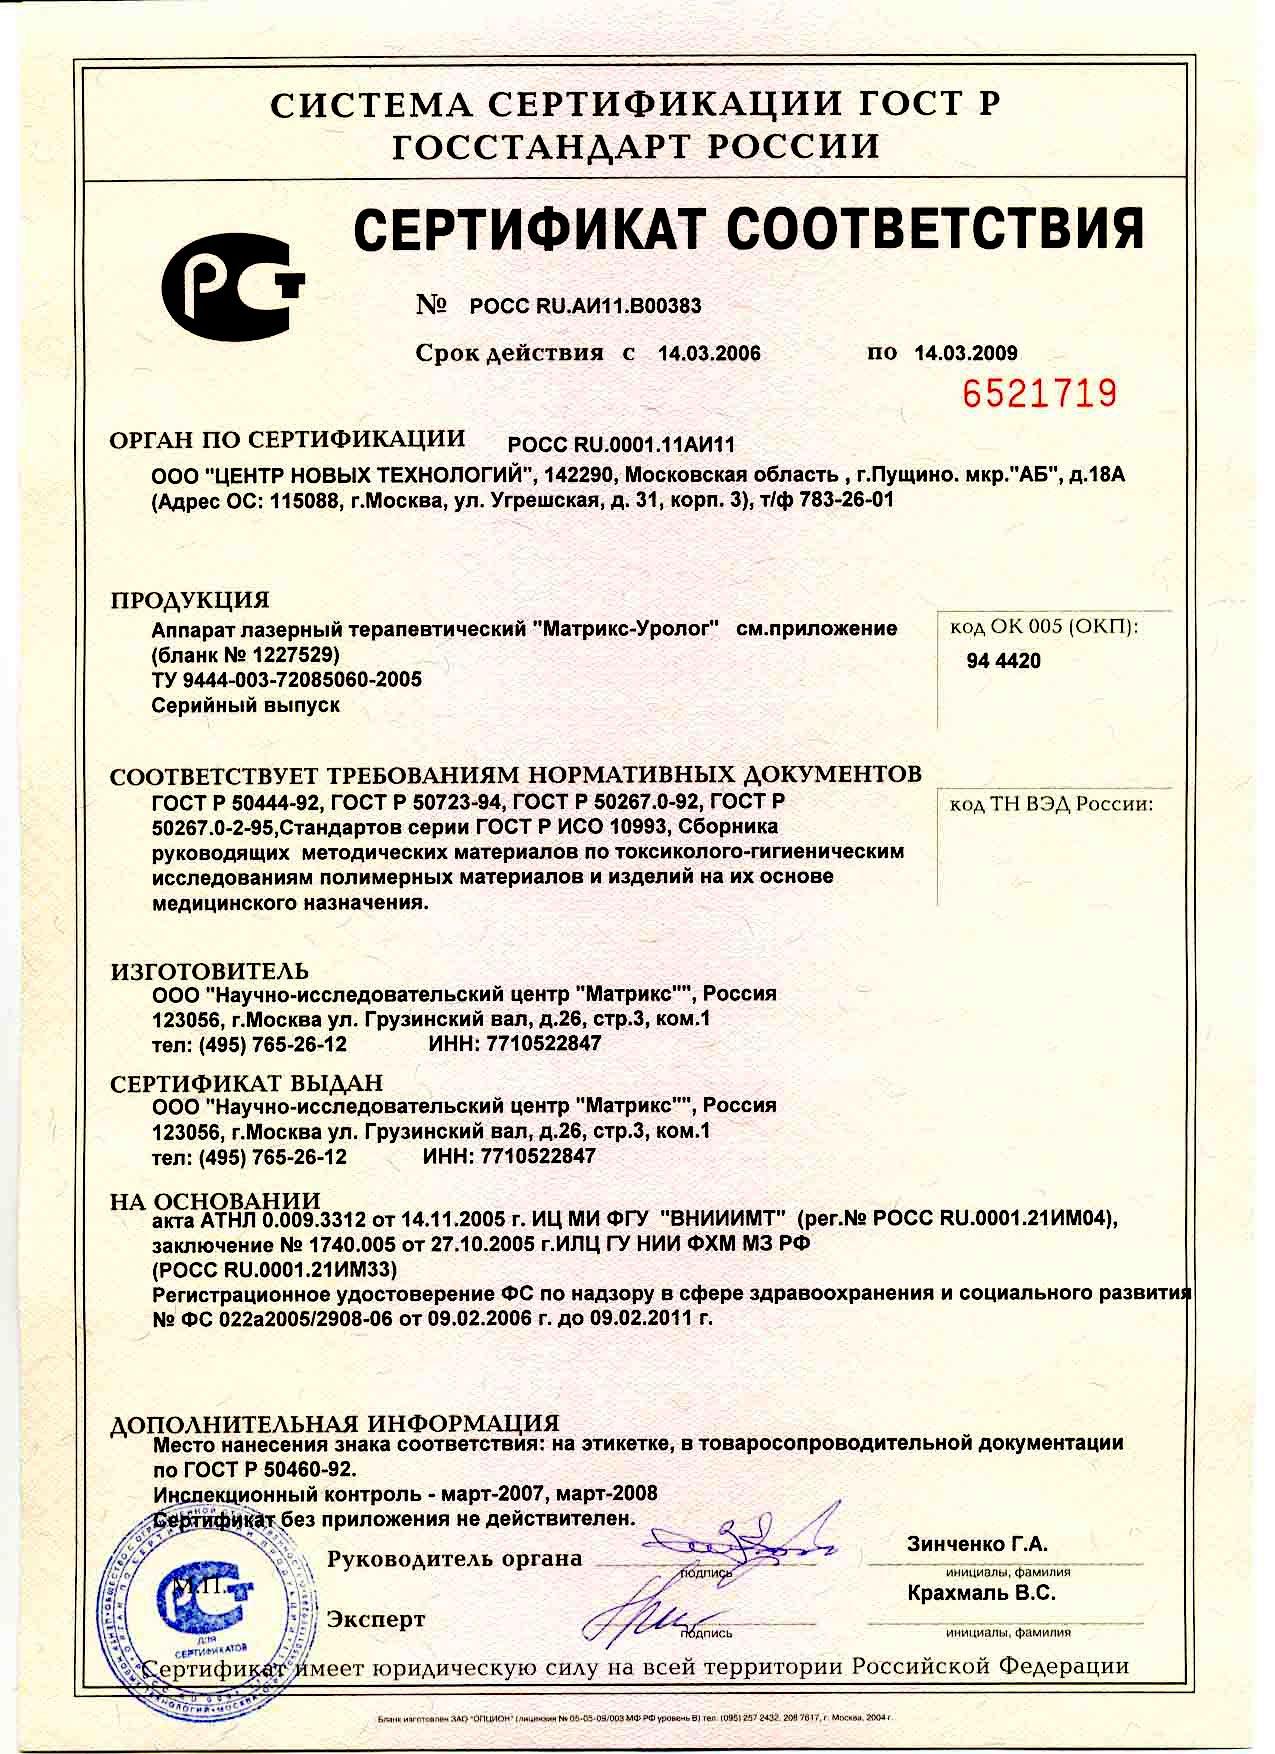 сертификат Матрикс-Уролог - аппарат лазеный терапевтический